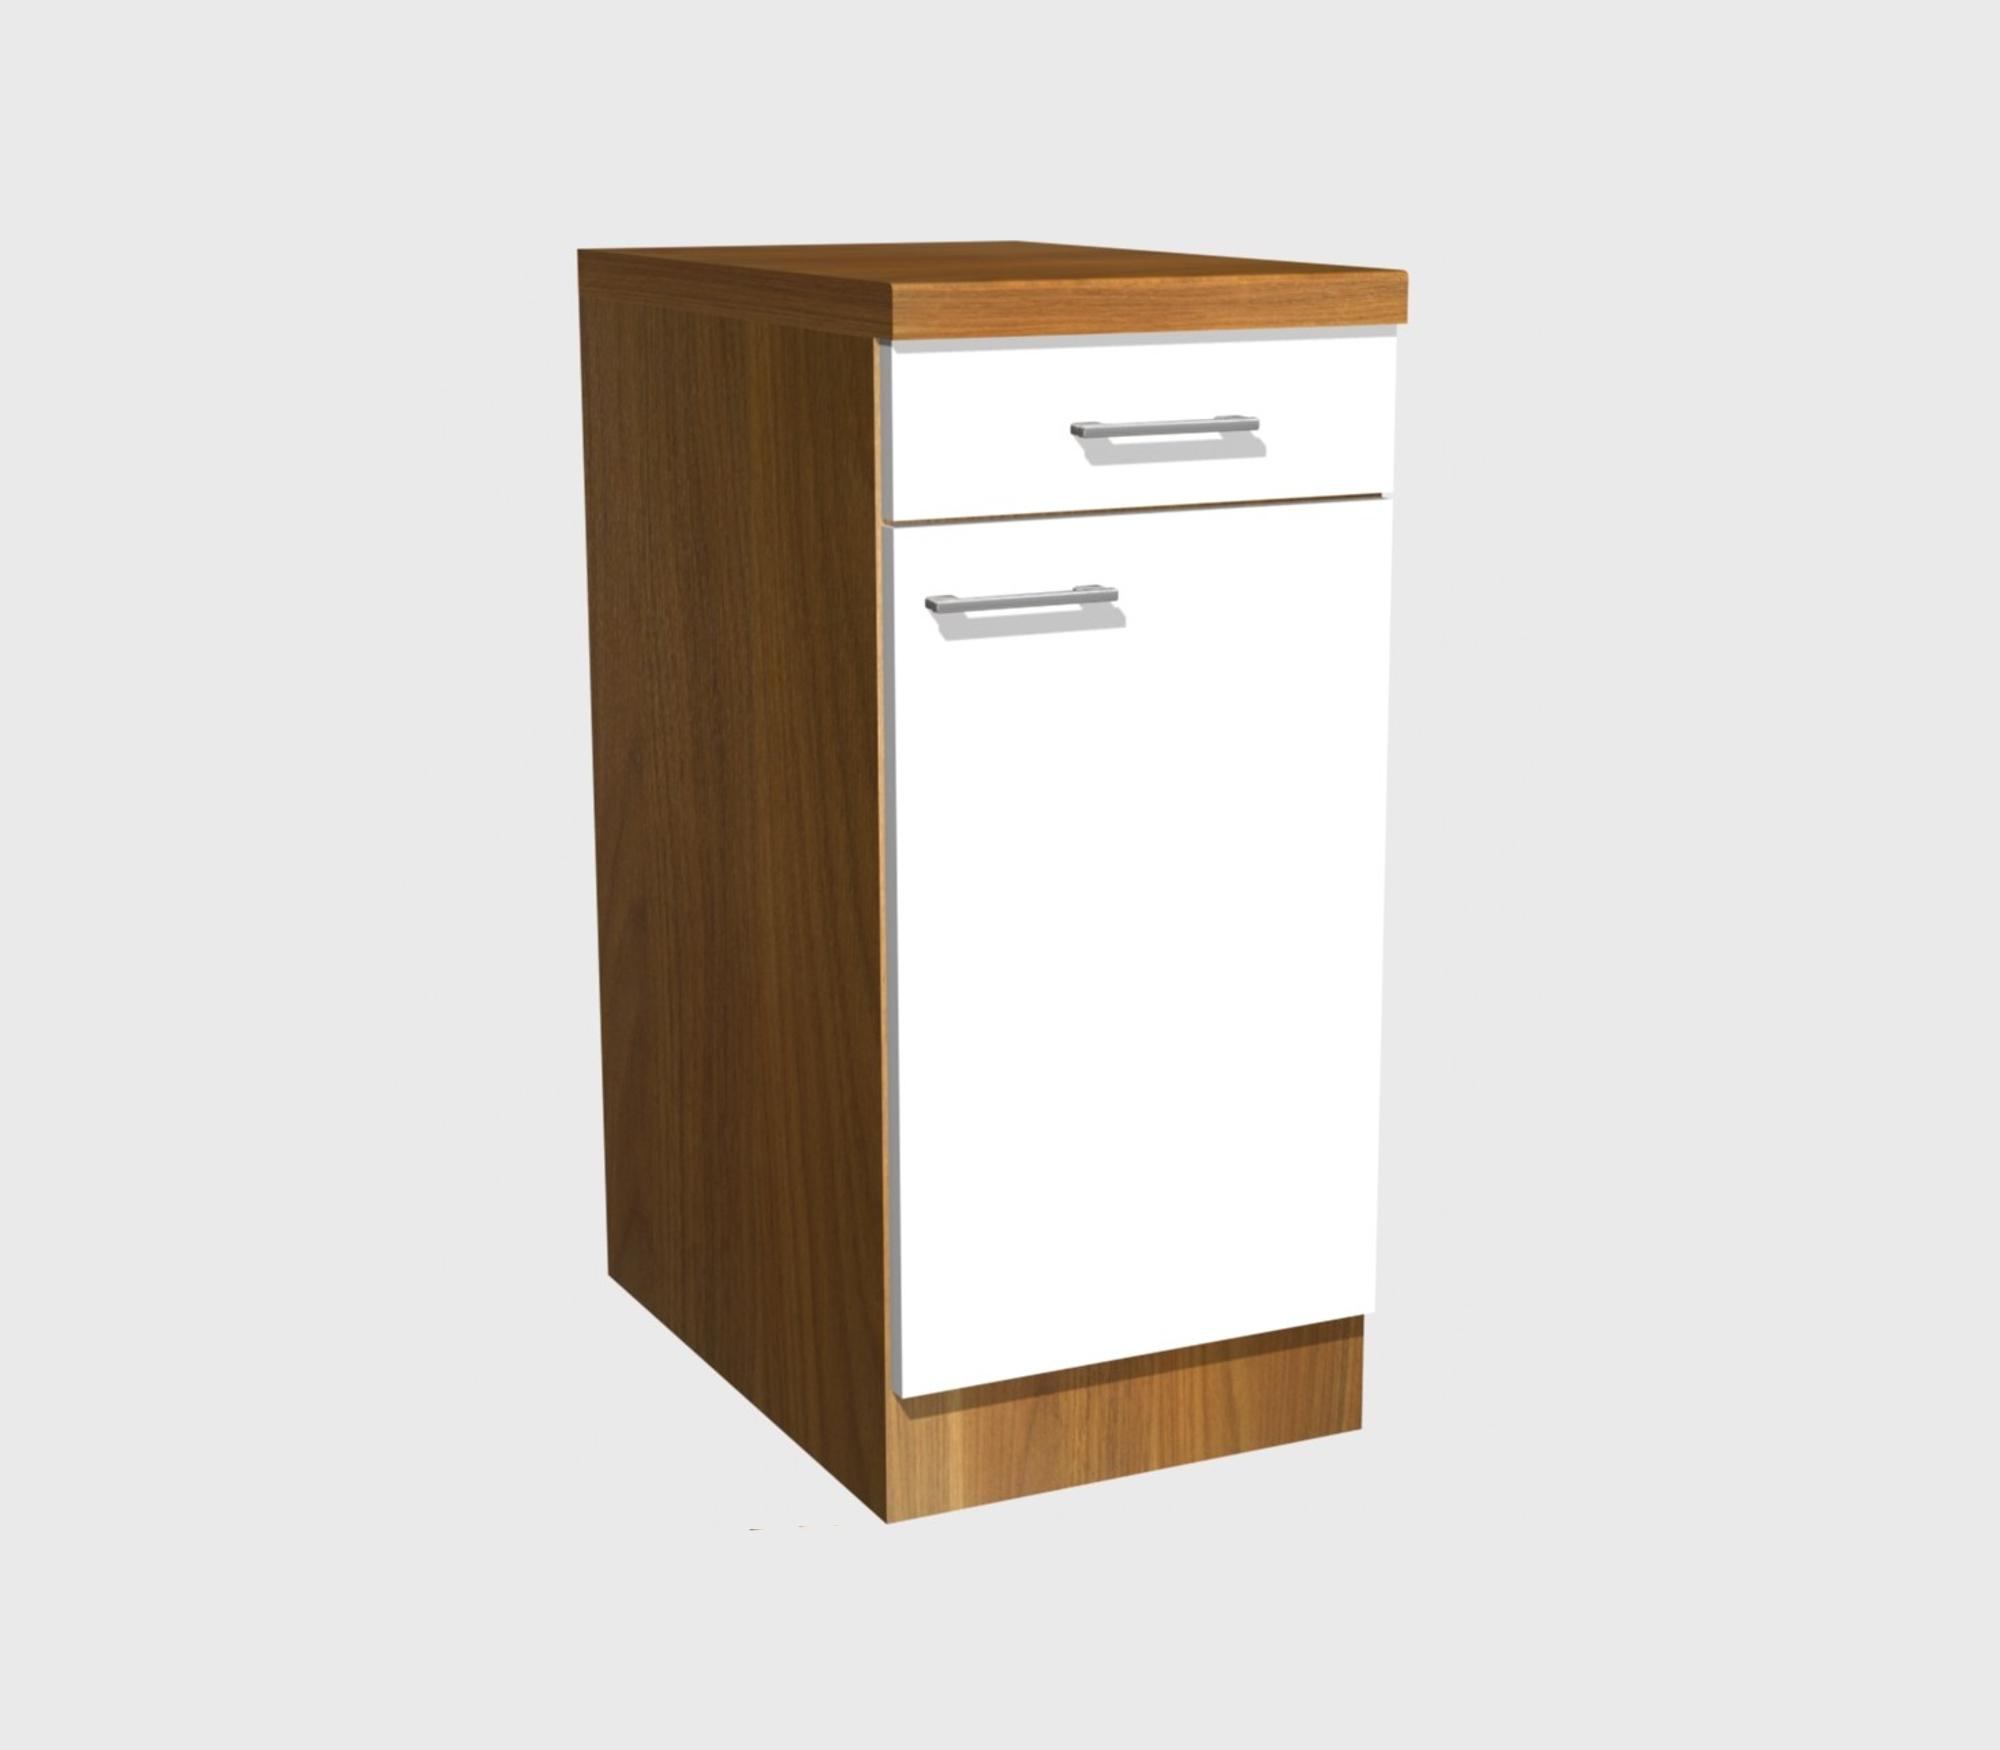 Full Size of Apothekerschrank 30 Cm Breit Ikea Nerdydisneynerd Küche Nolte Schlafzimmer Betten Wohnzimmer Nolte Apothekerschrank